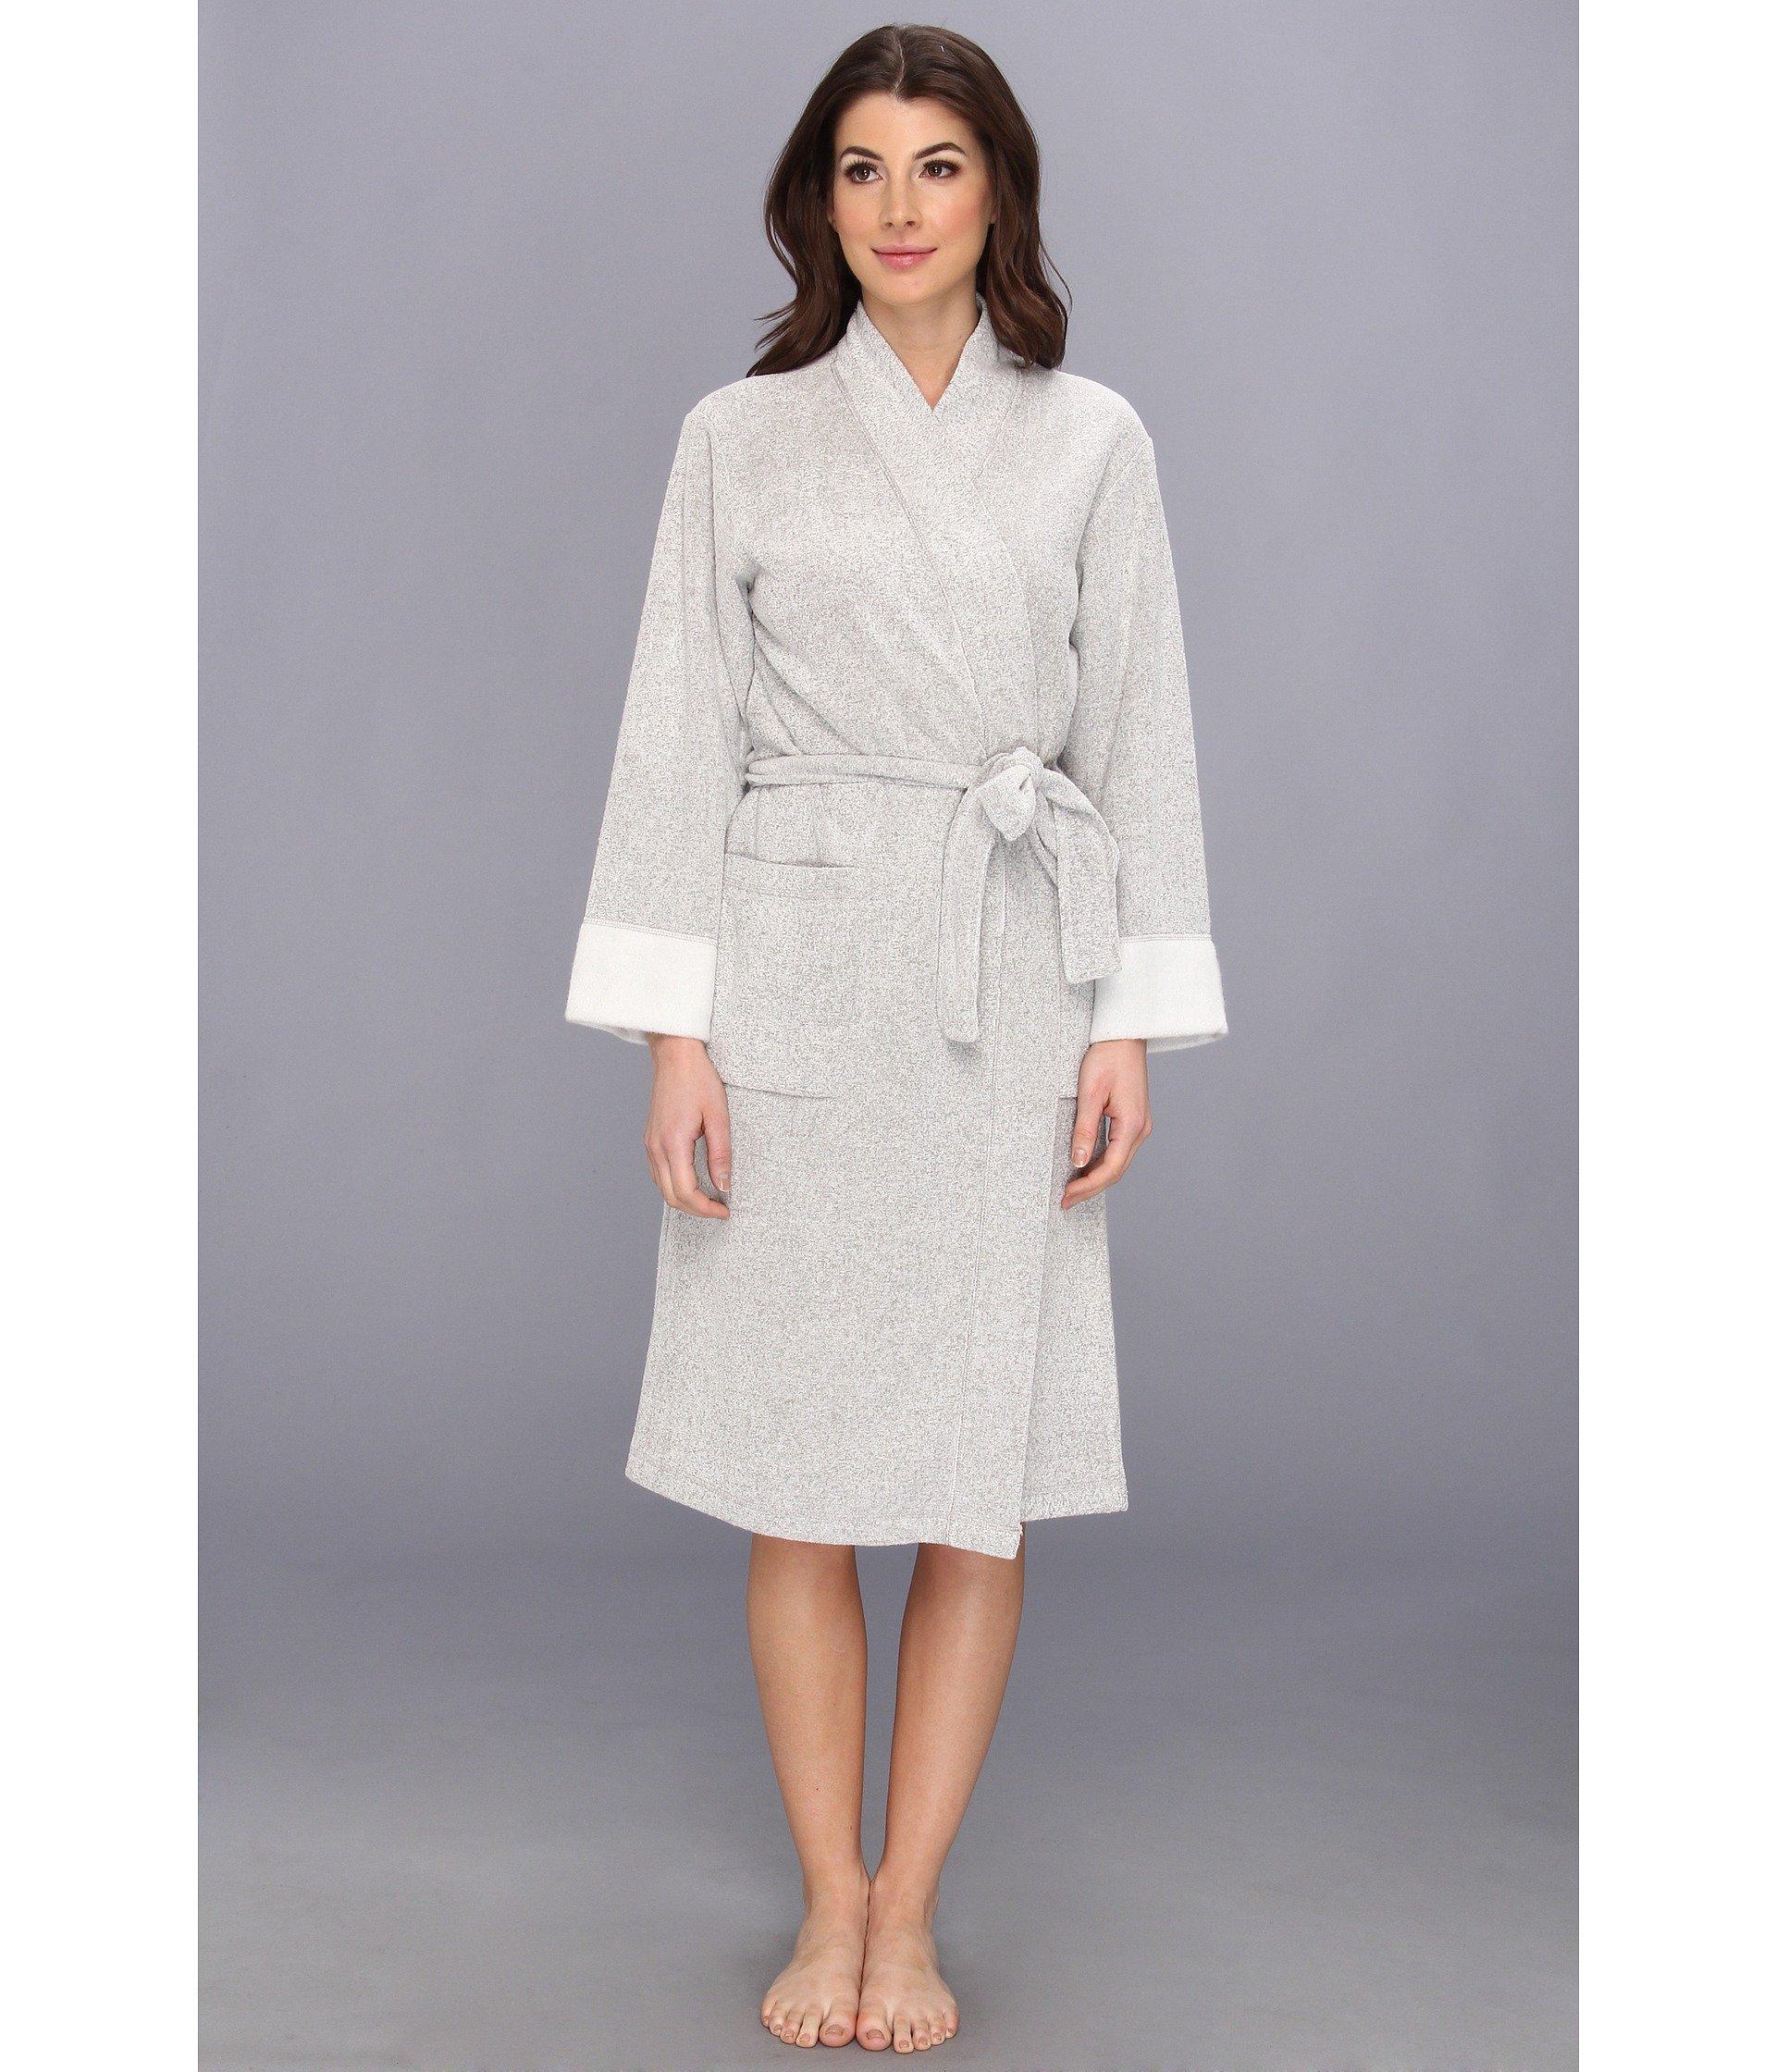 N by Natori, Sleepwear, Women | Shipped Free at Zappos